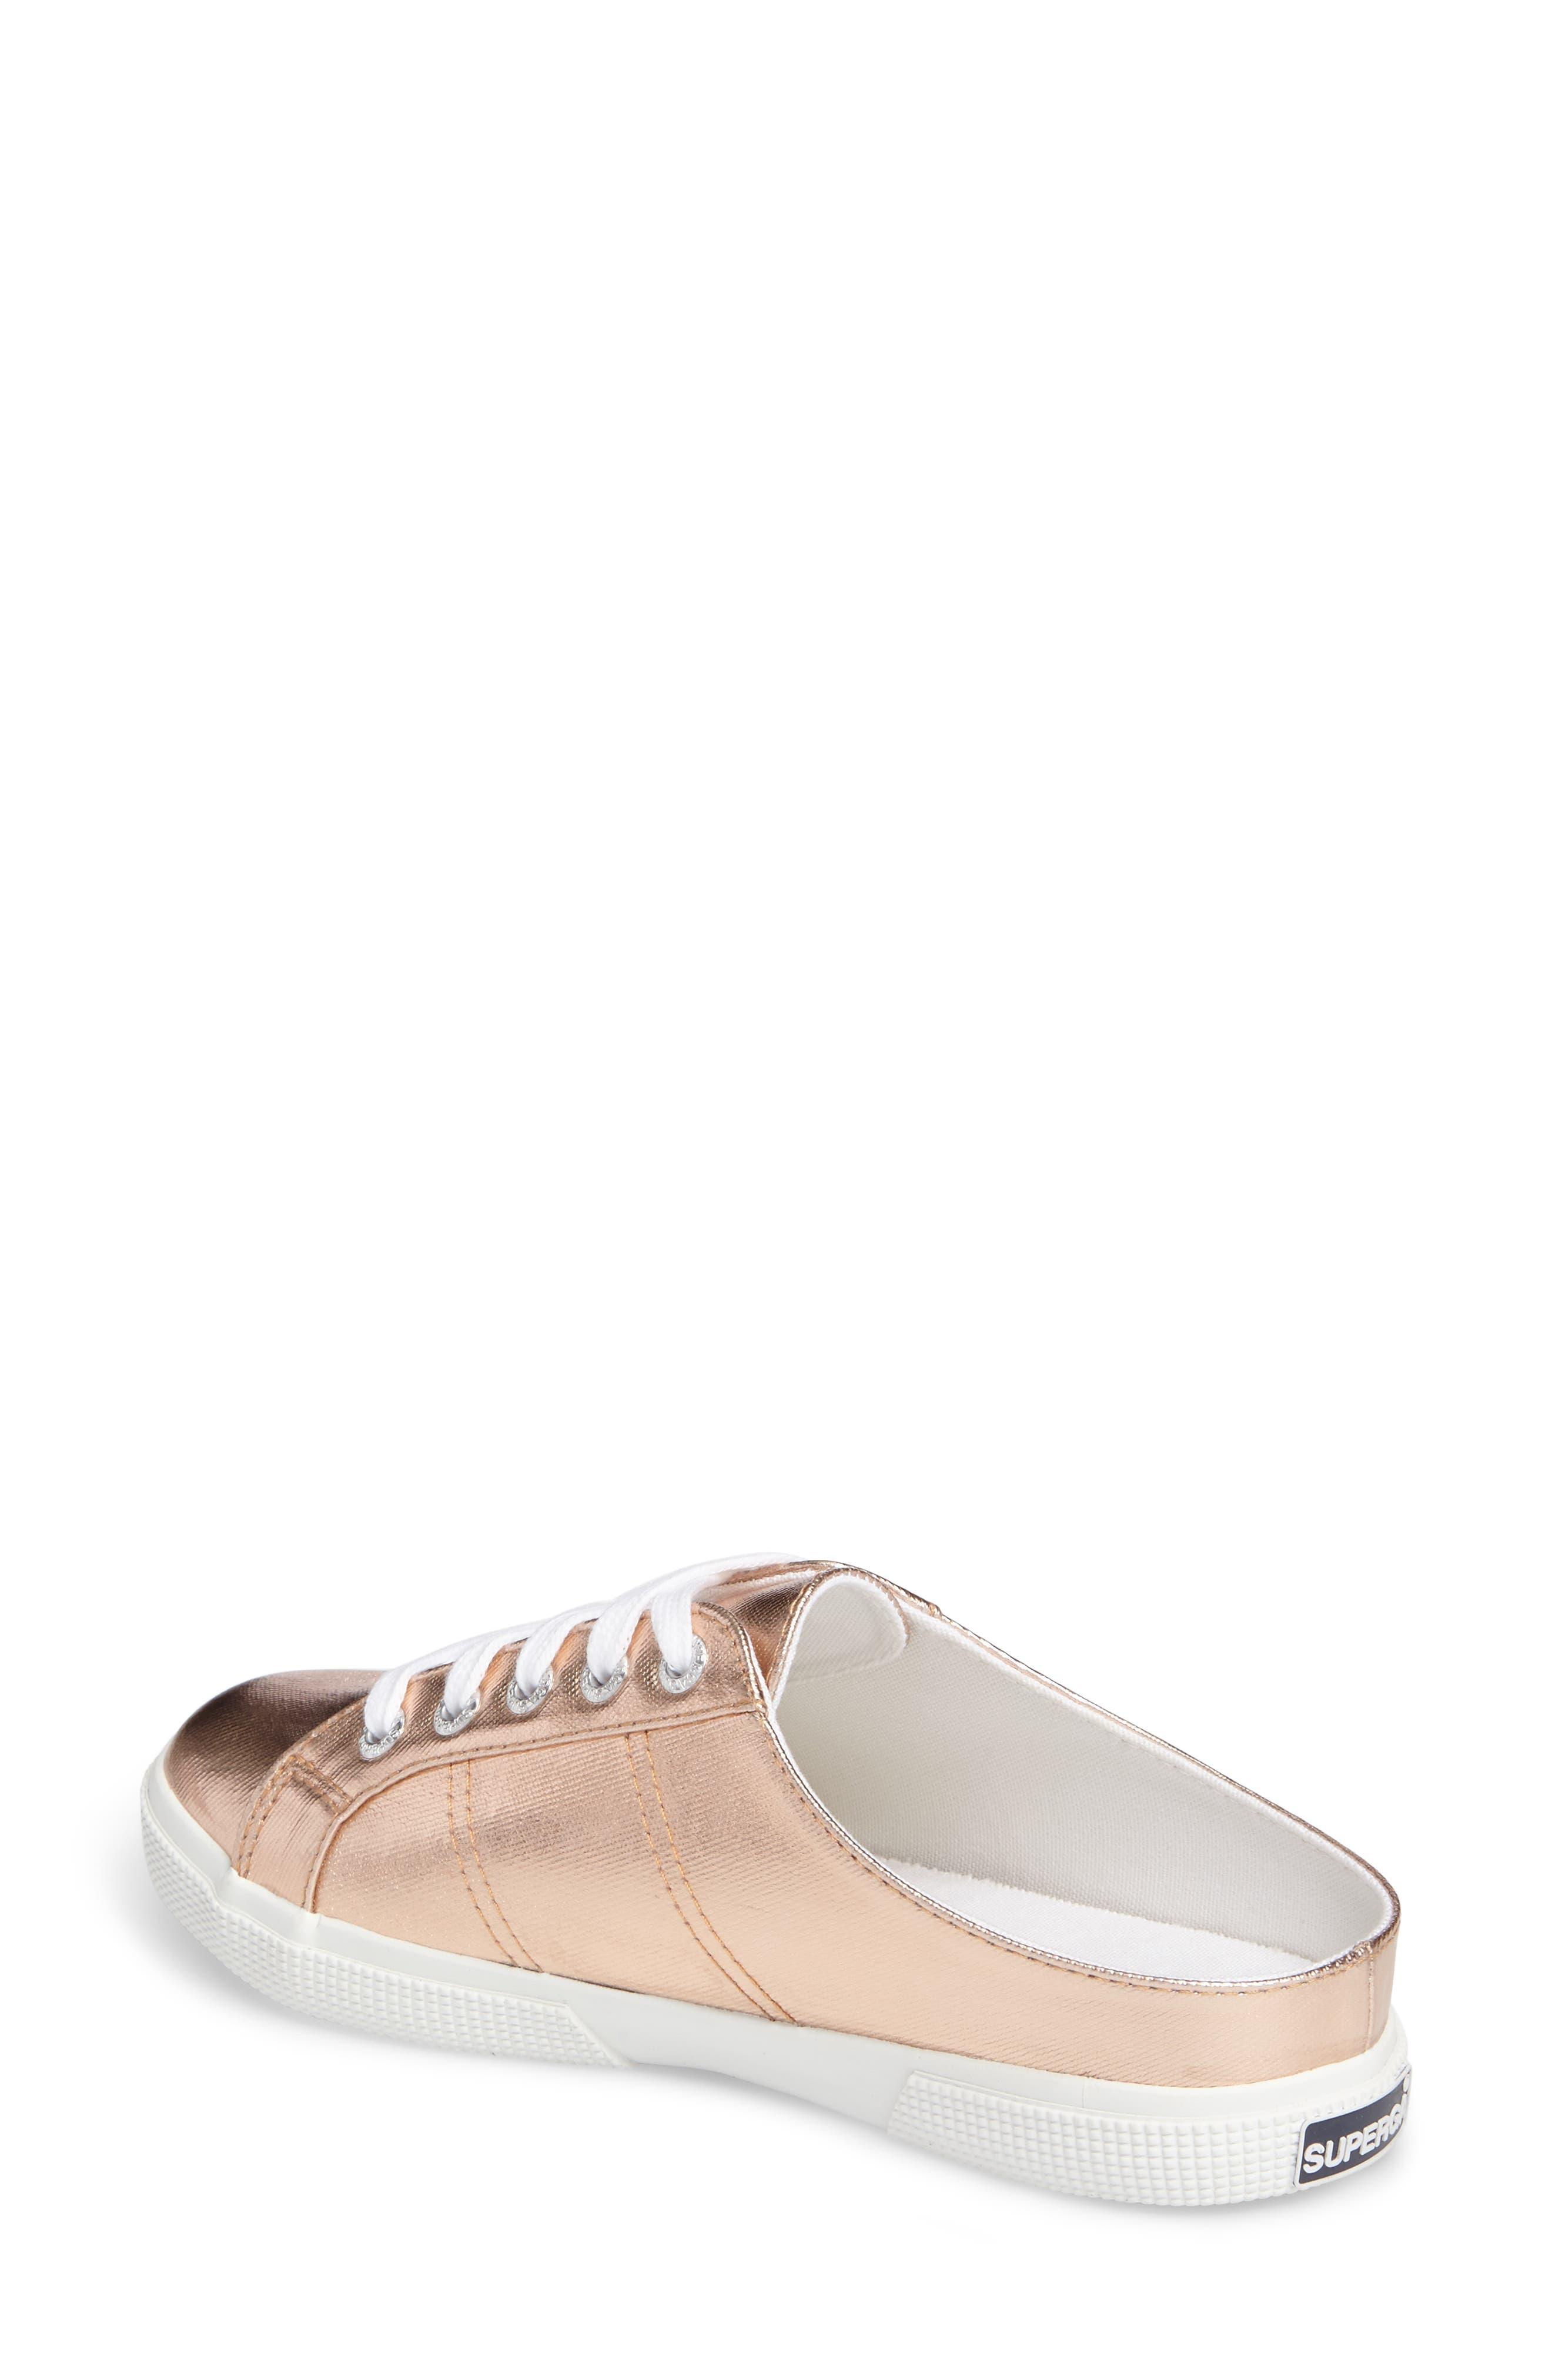 2288 Sneaker Mule,                             Alternate thumbnail 2, color,                             Rose Gold